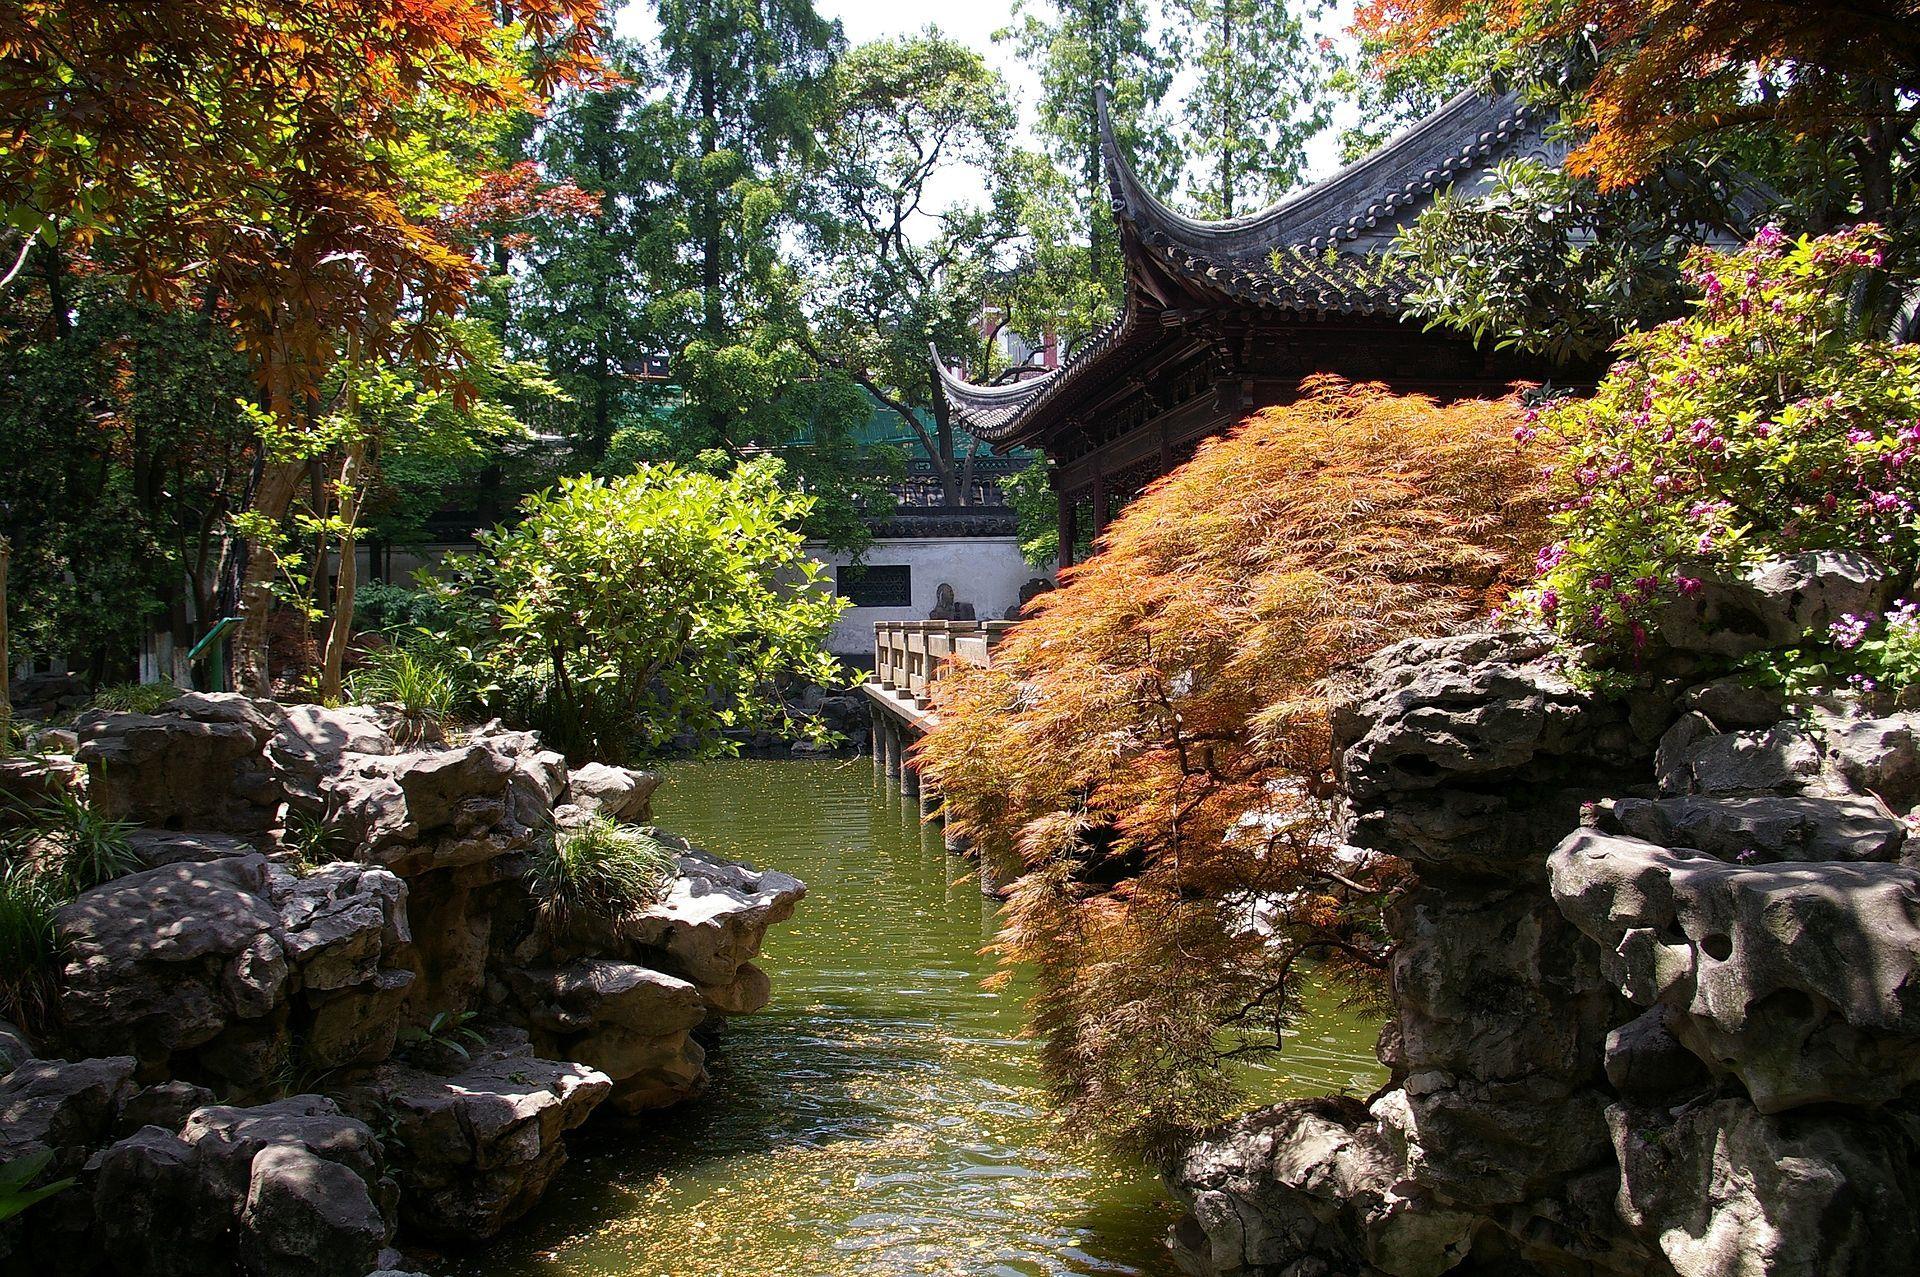 Garden Landscape Design Wikipedia Awesome Chinese Garden Chinese Garden Most Beautiful Gardens Amazing Gardens